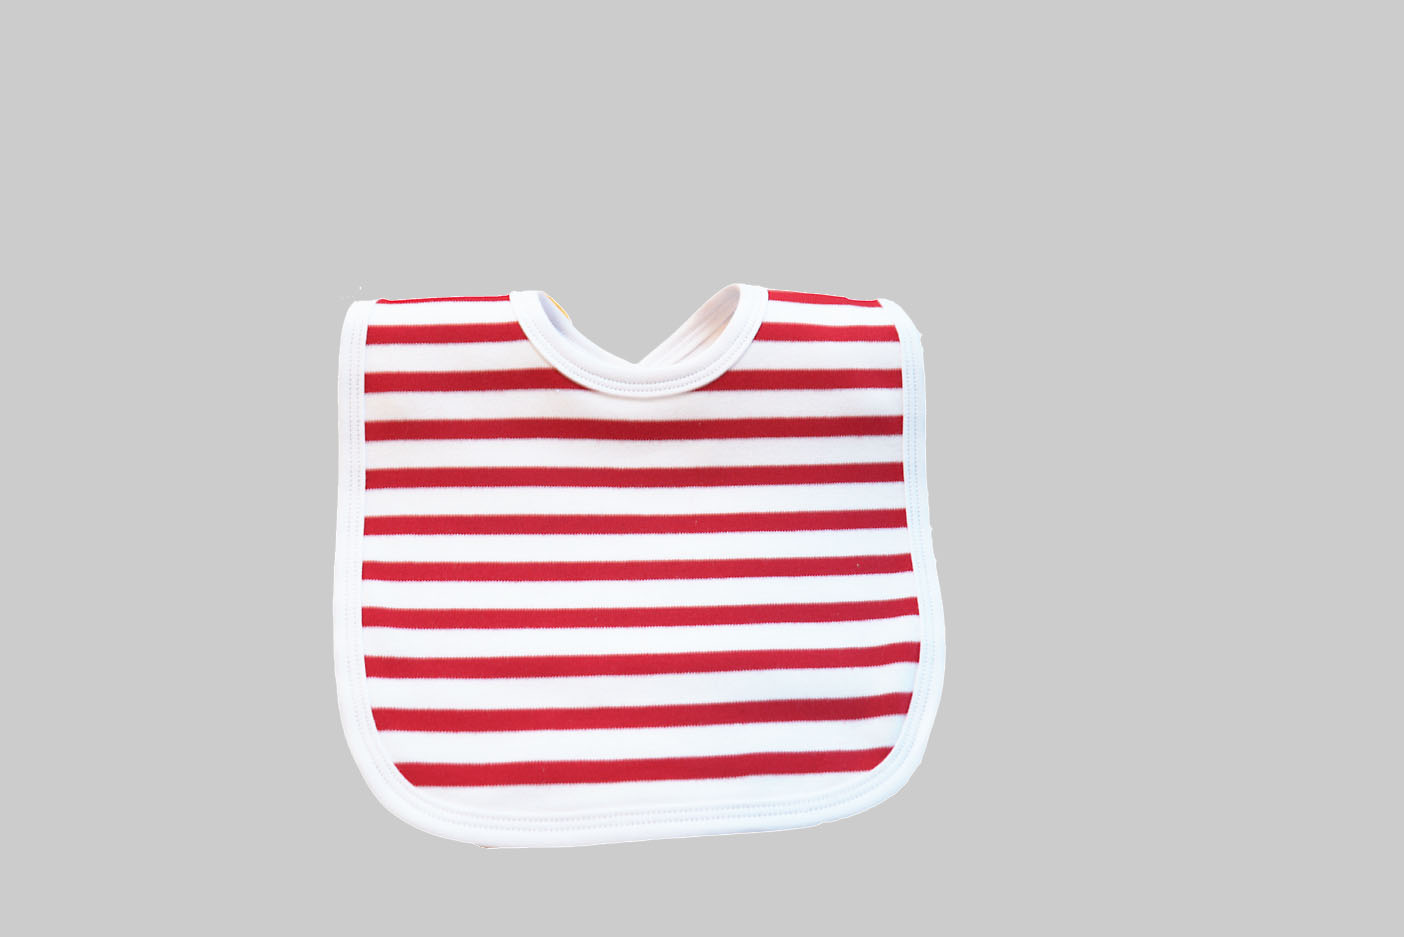 Woven Red Stripes Baby Bib